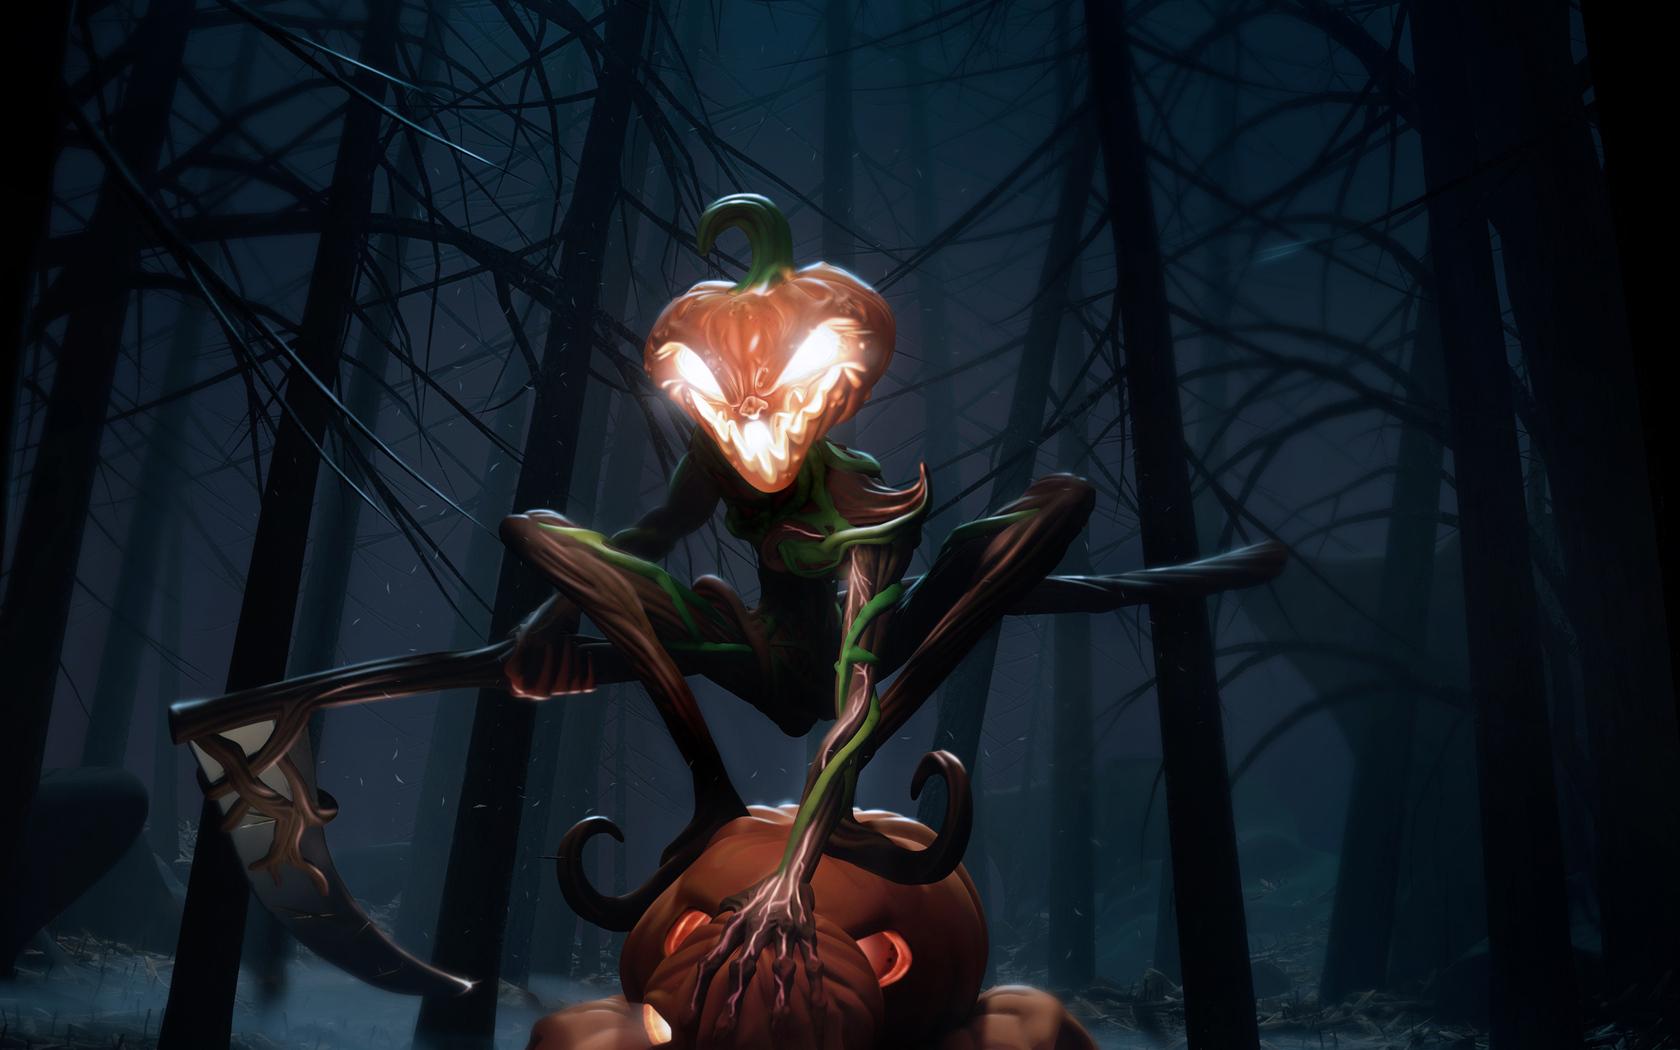 the-pumpkin-king-4k-p4.jpg